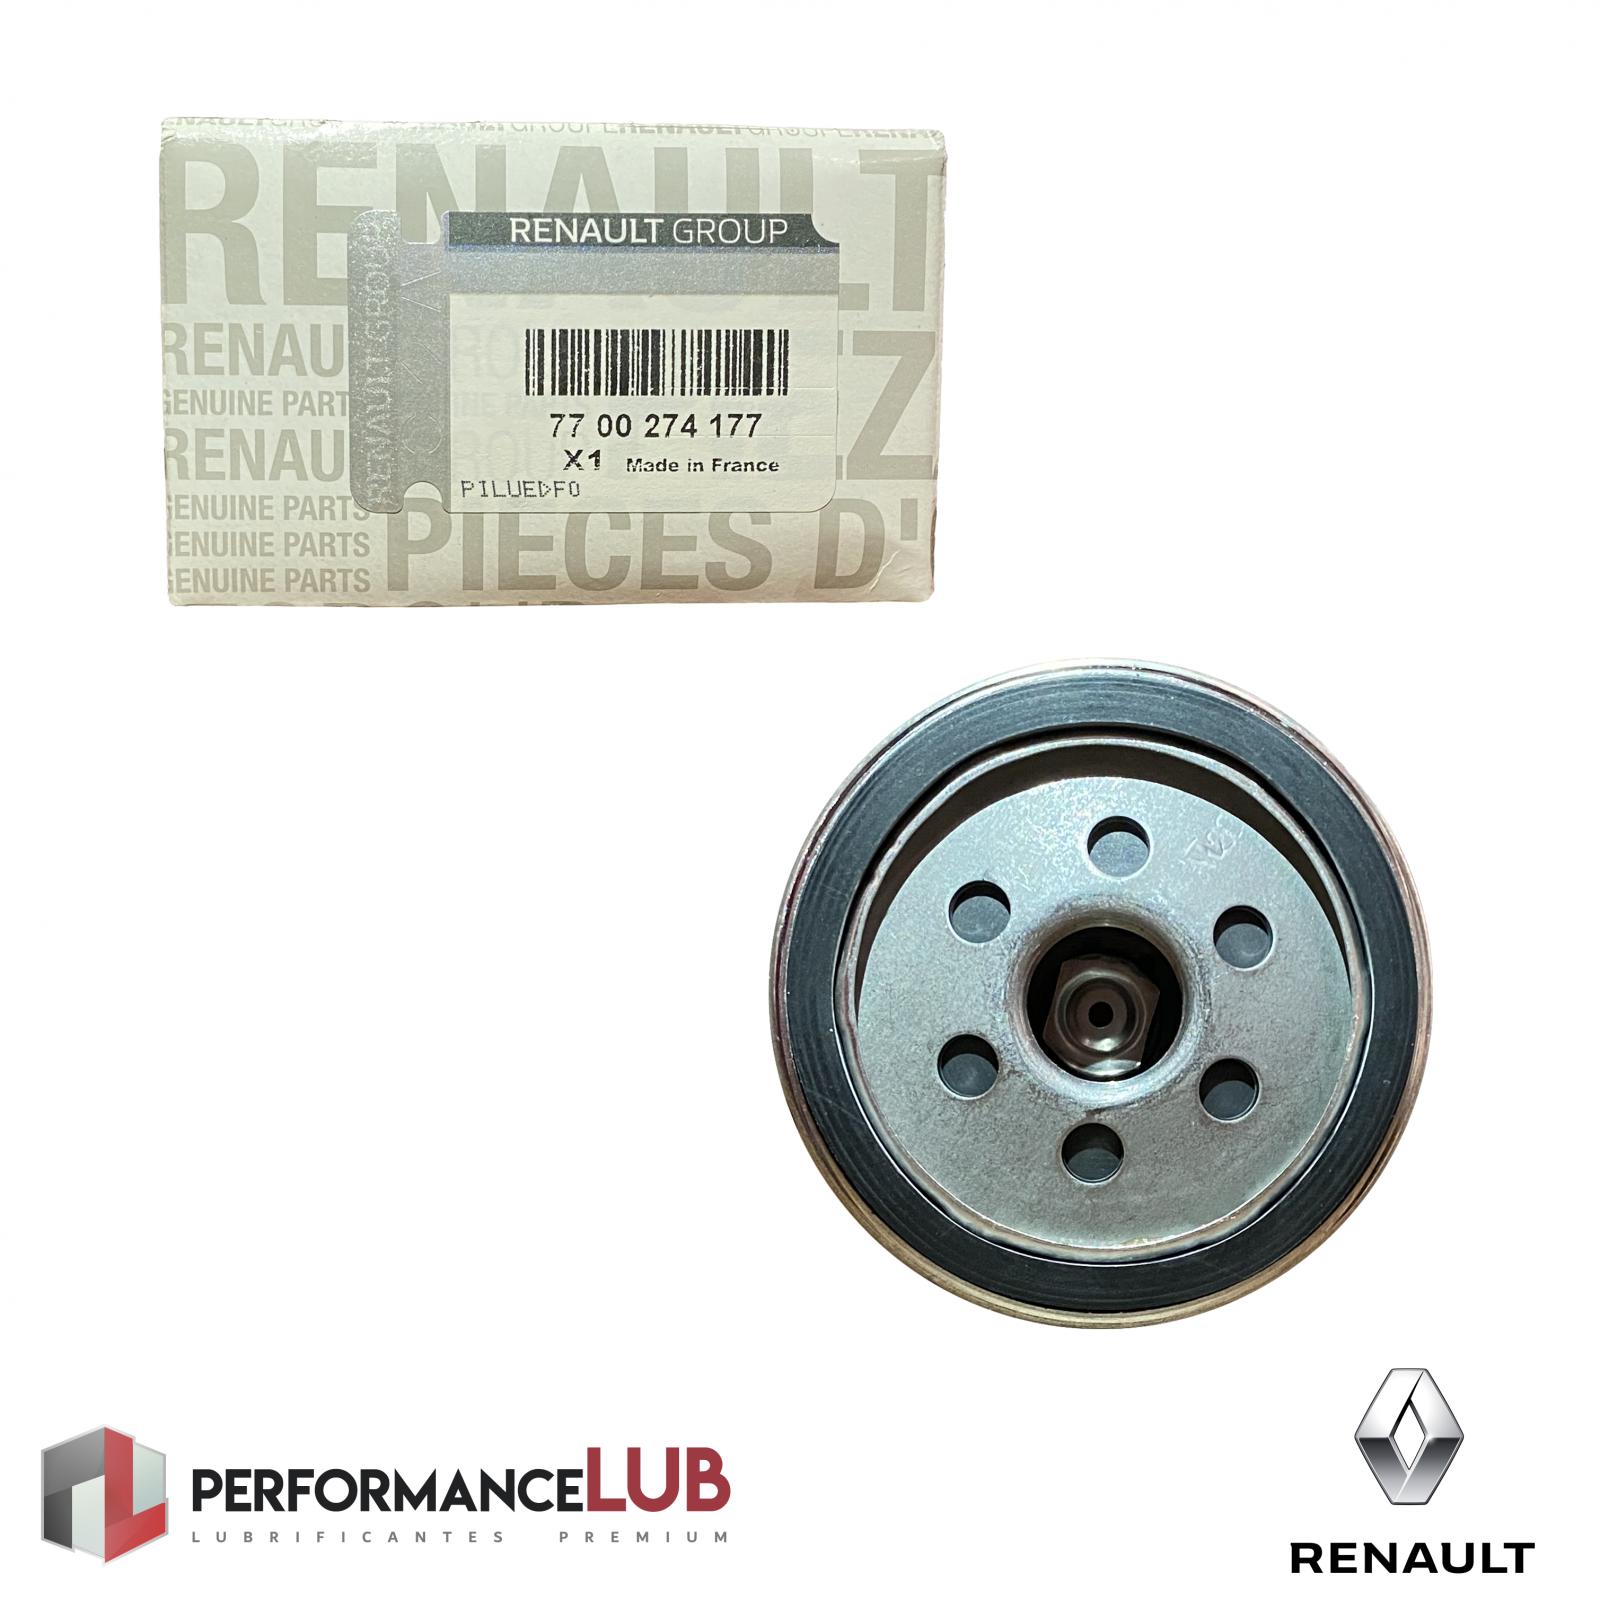 Filtro de óleo do motor - Renault - 77 00 274 177 - PerformanceLUB Lubrificantes Premium